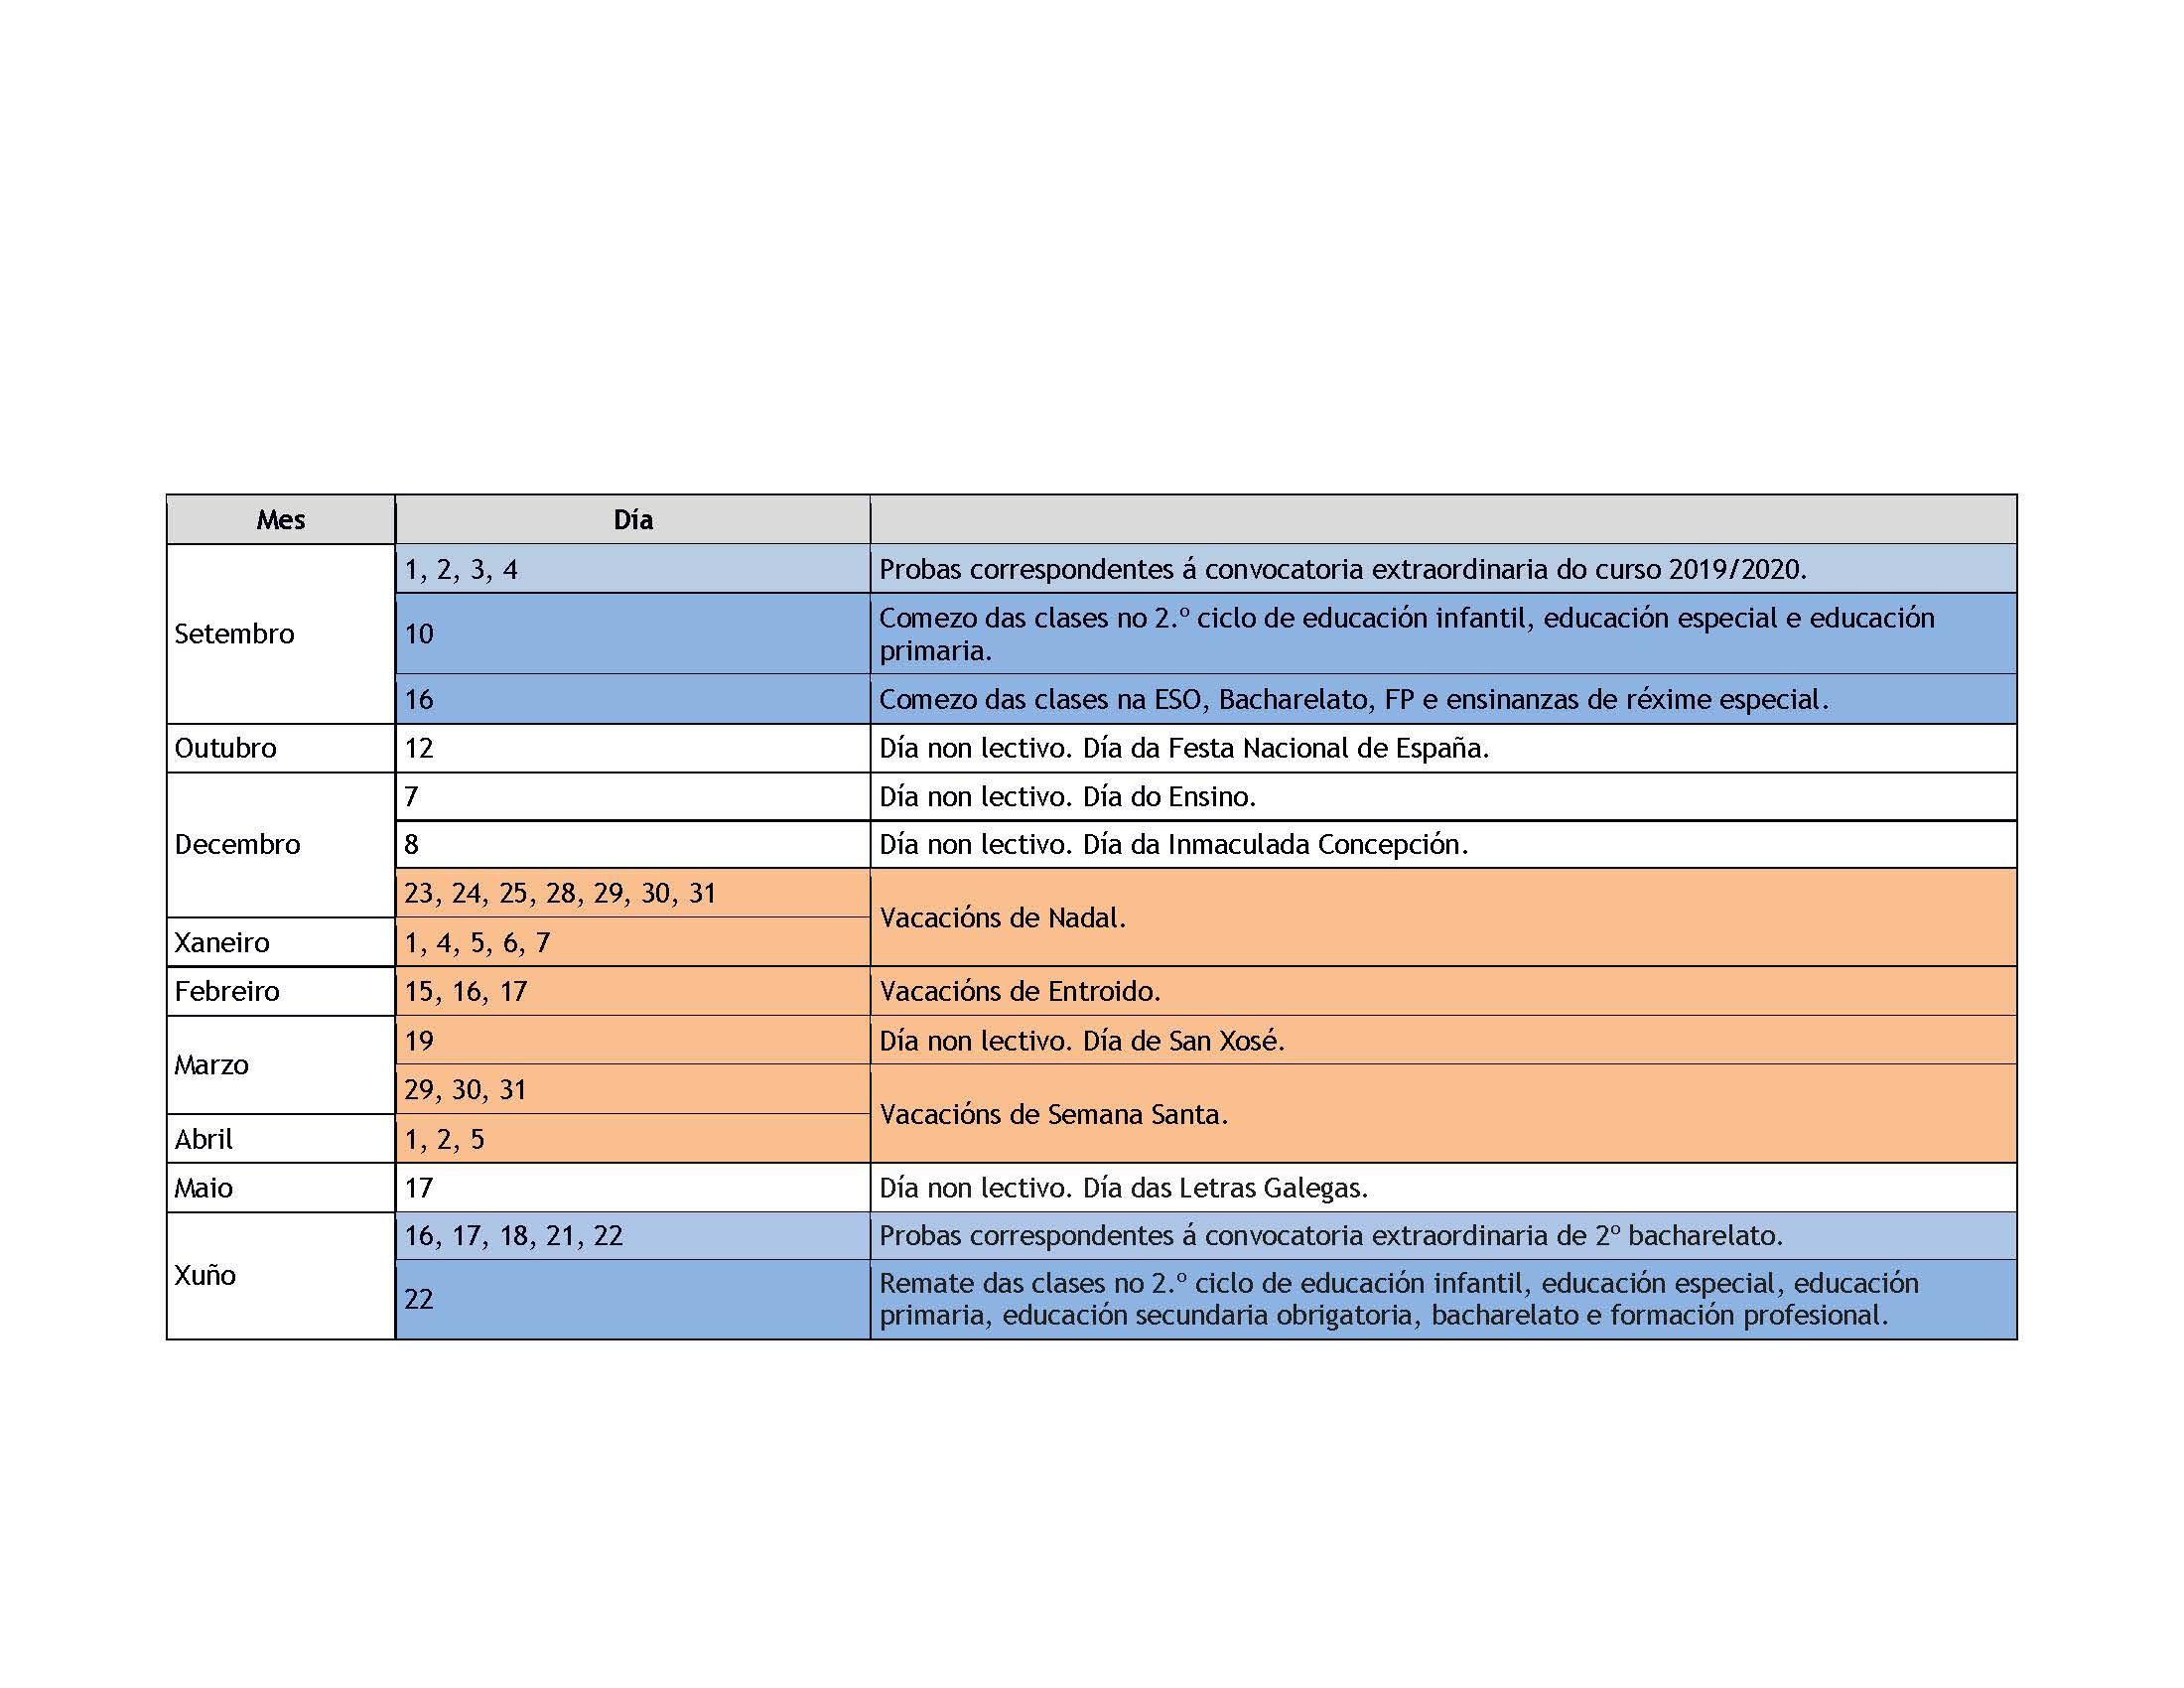 calendario_escolar20-21 (1)_Página_2